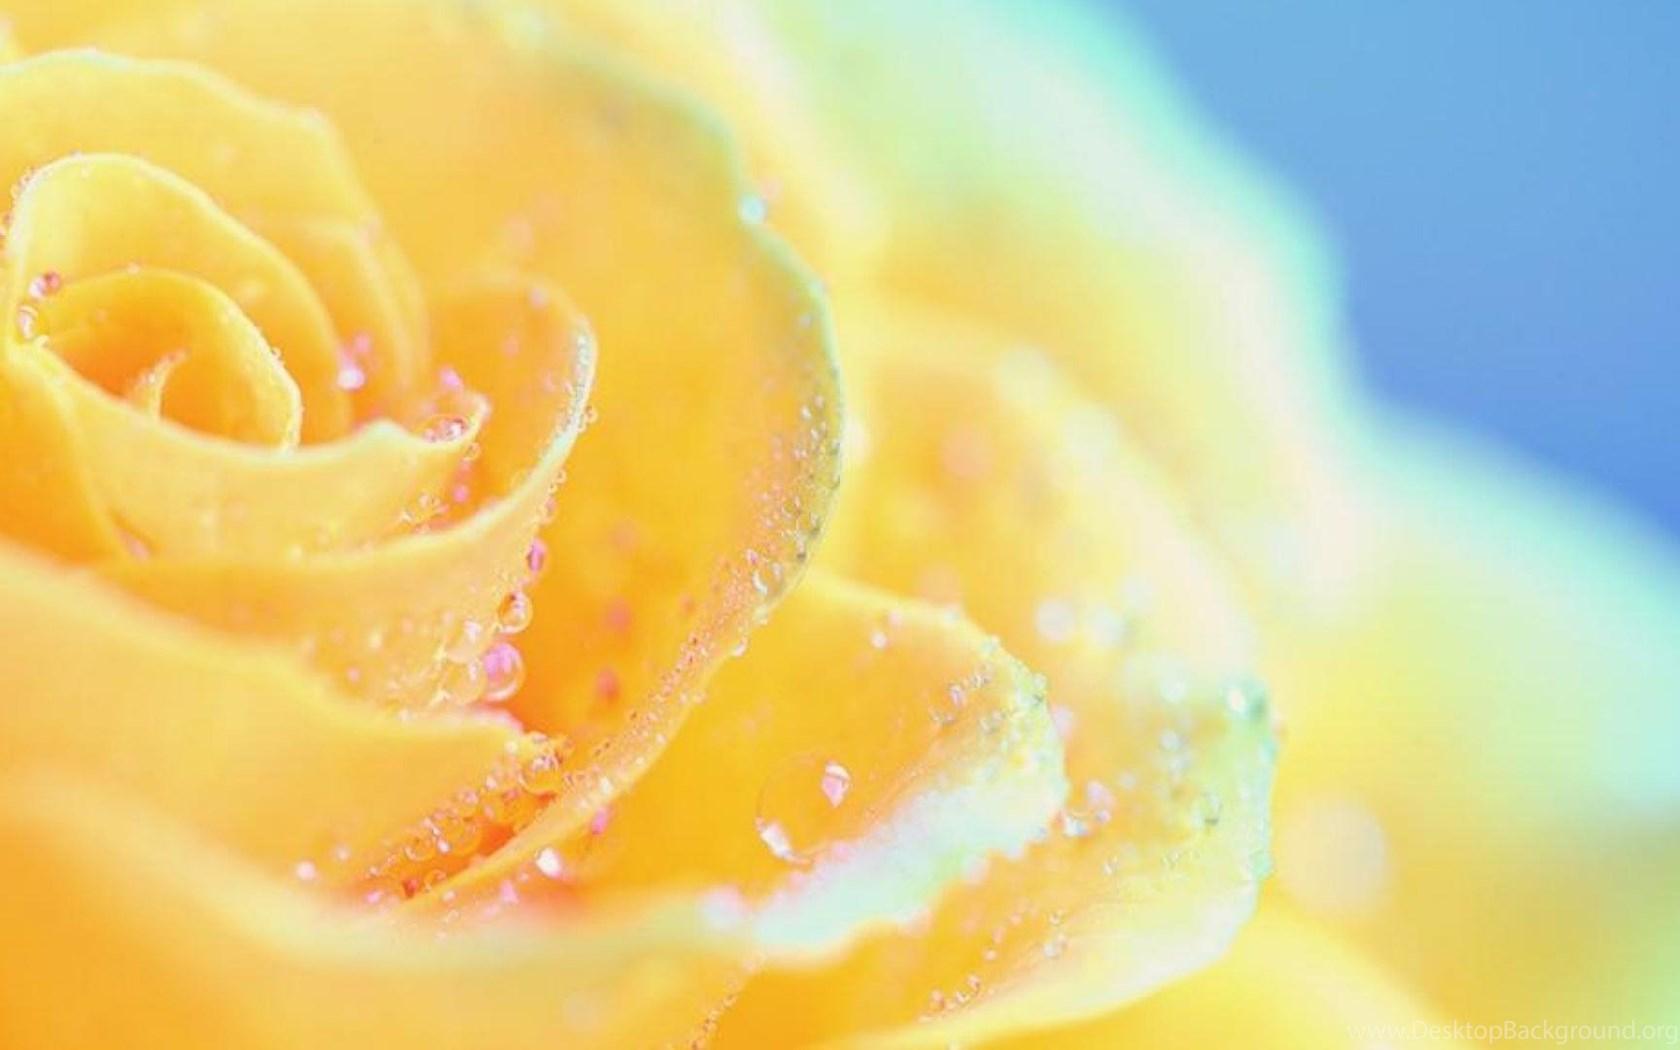 BEAUTIFUL YELLOW ROSE WALLPAPER ( Desktop Background